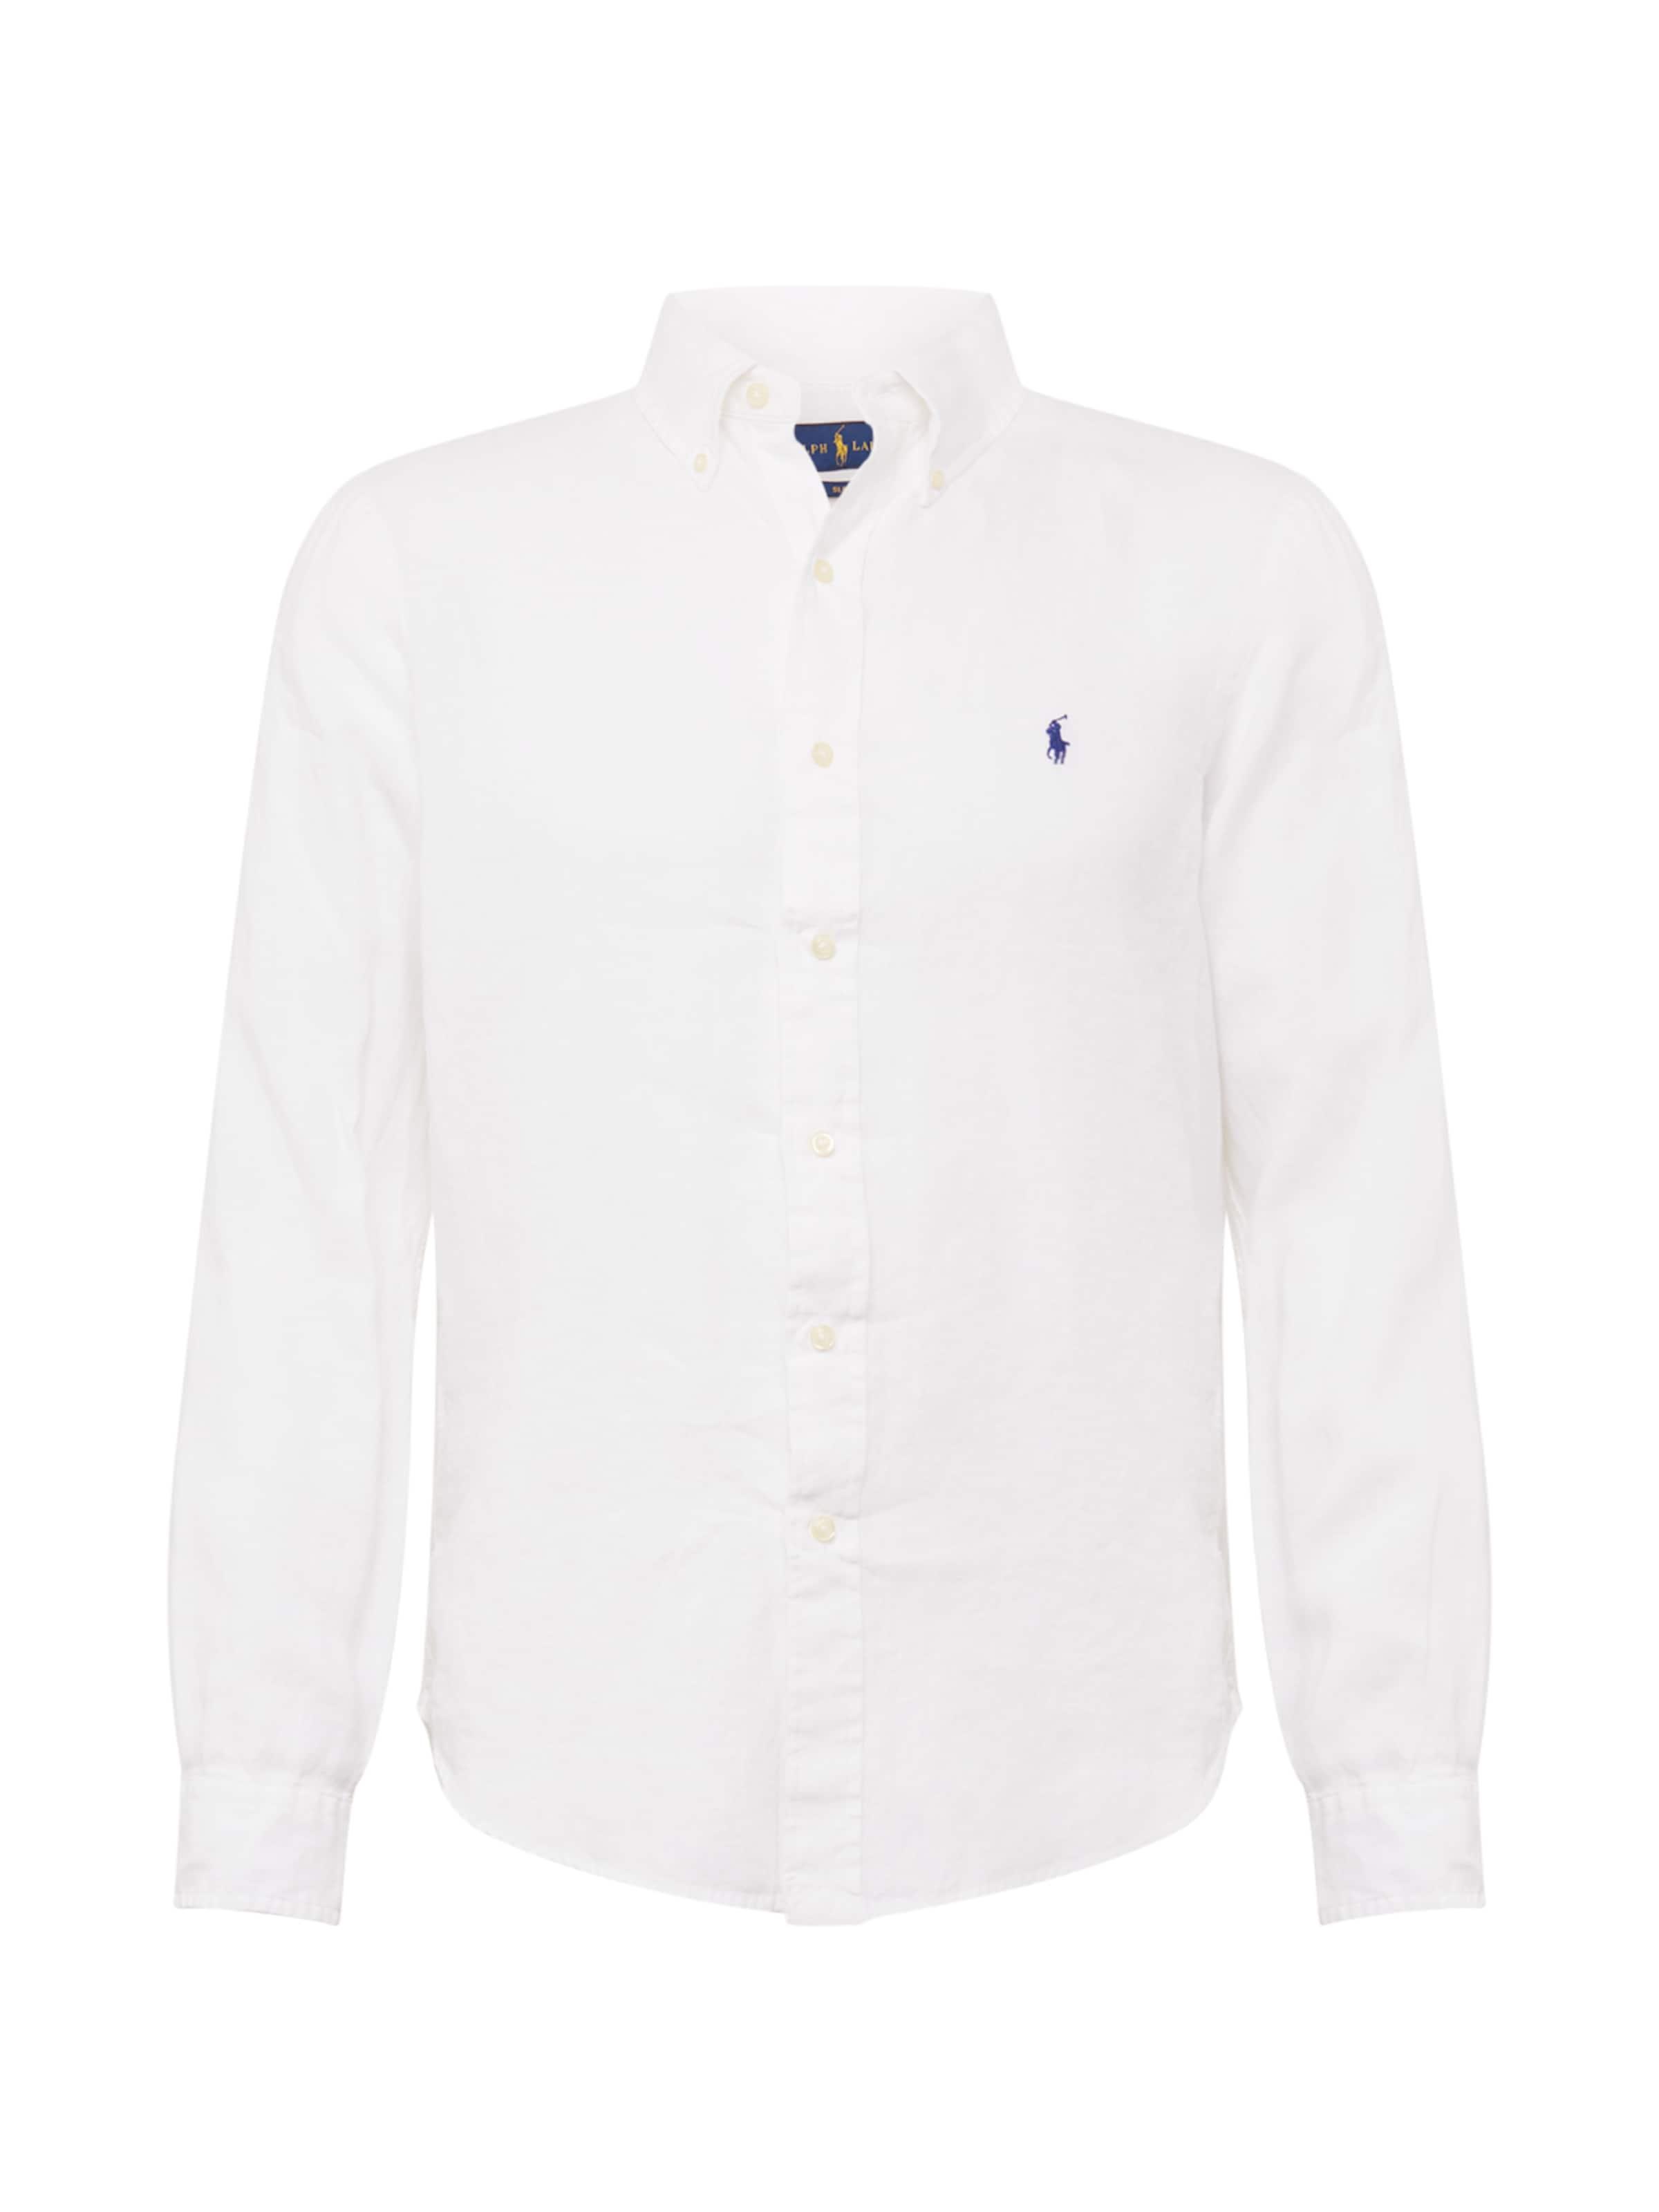 'sl Polo Lauren Sleeve En Rouge Ppc Ralph Chemise Sp long sport Bd Shirt' gIyb76vYfm